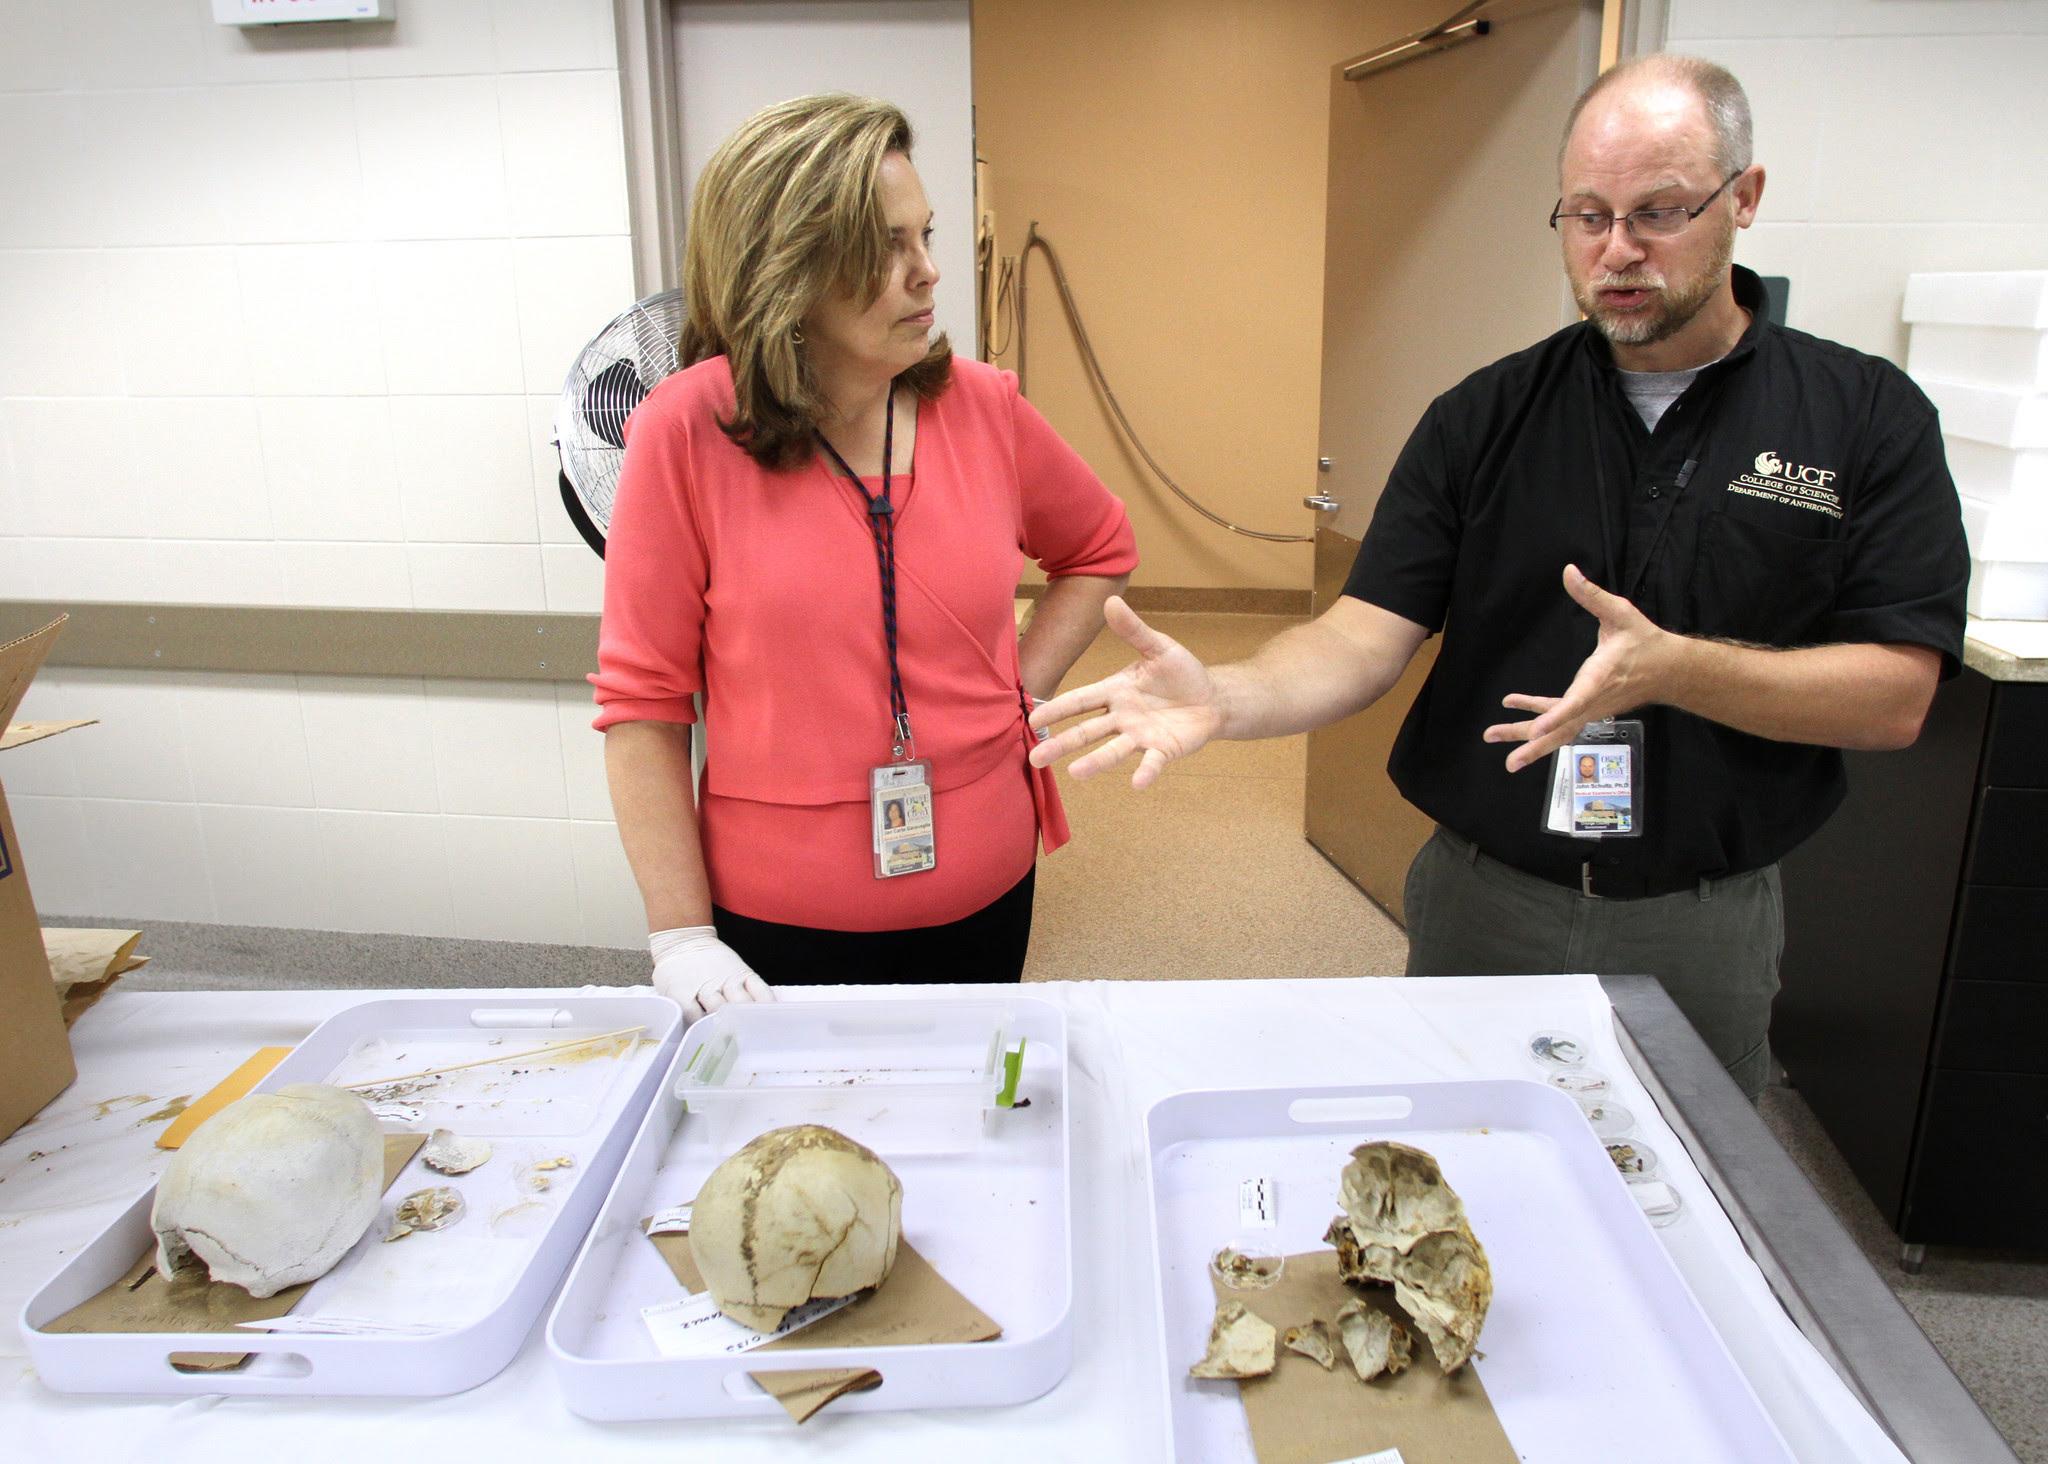 Dr Jan Garavaglia and Dr John Schultz discuss the two skulls